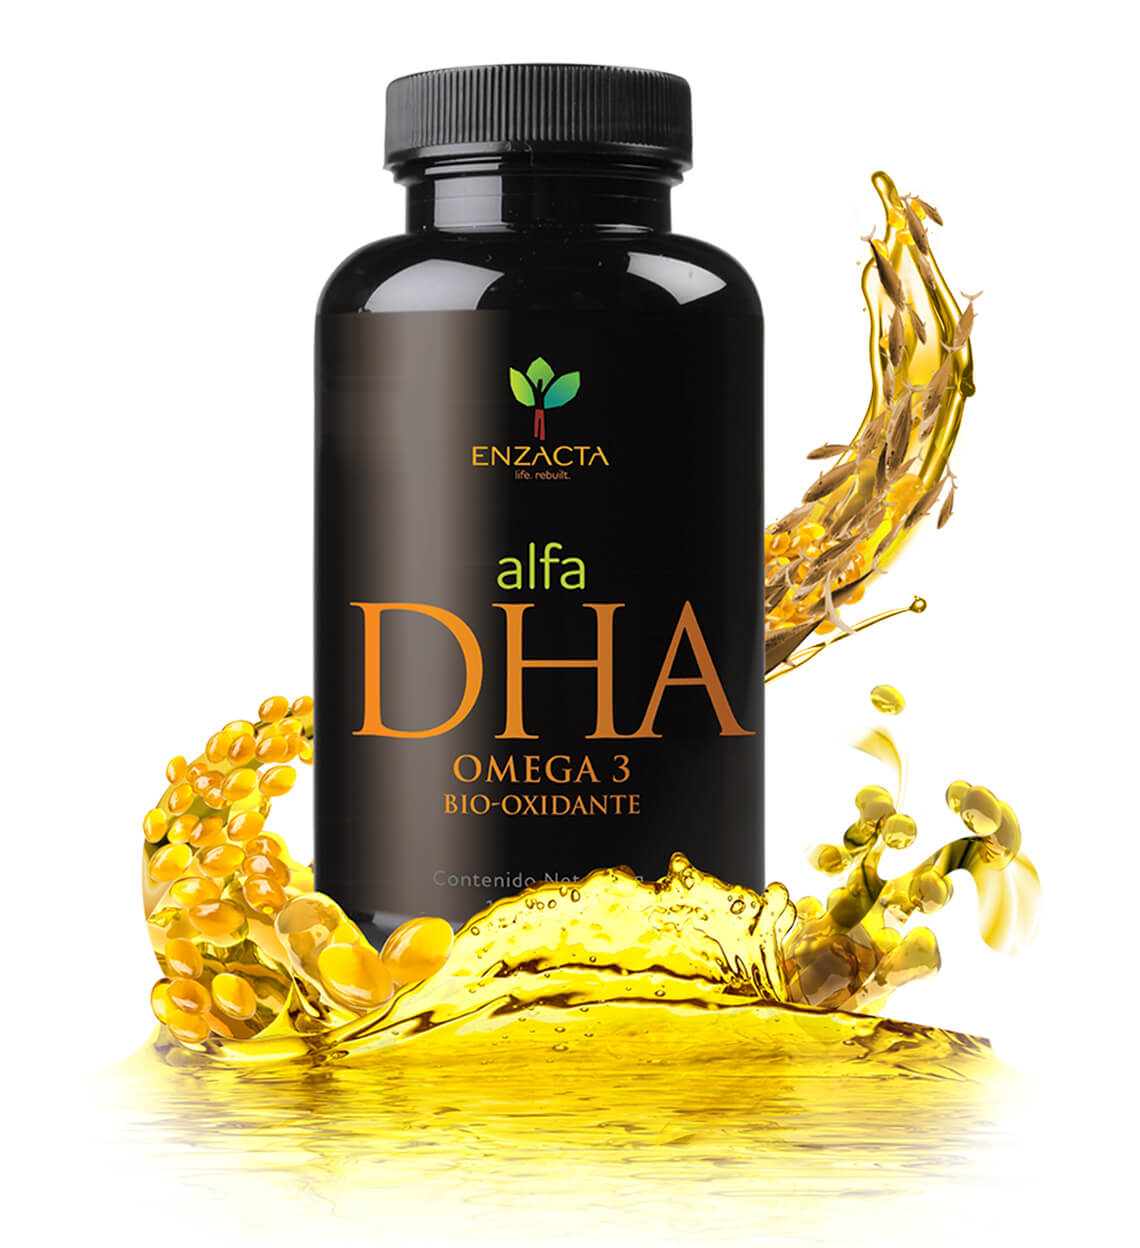 alfa DHA  - Bottle ingredients